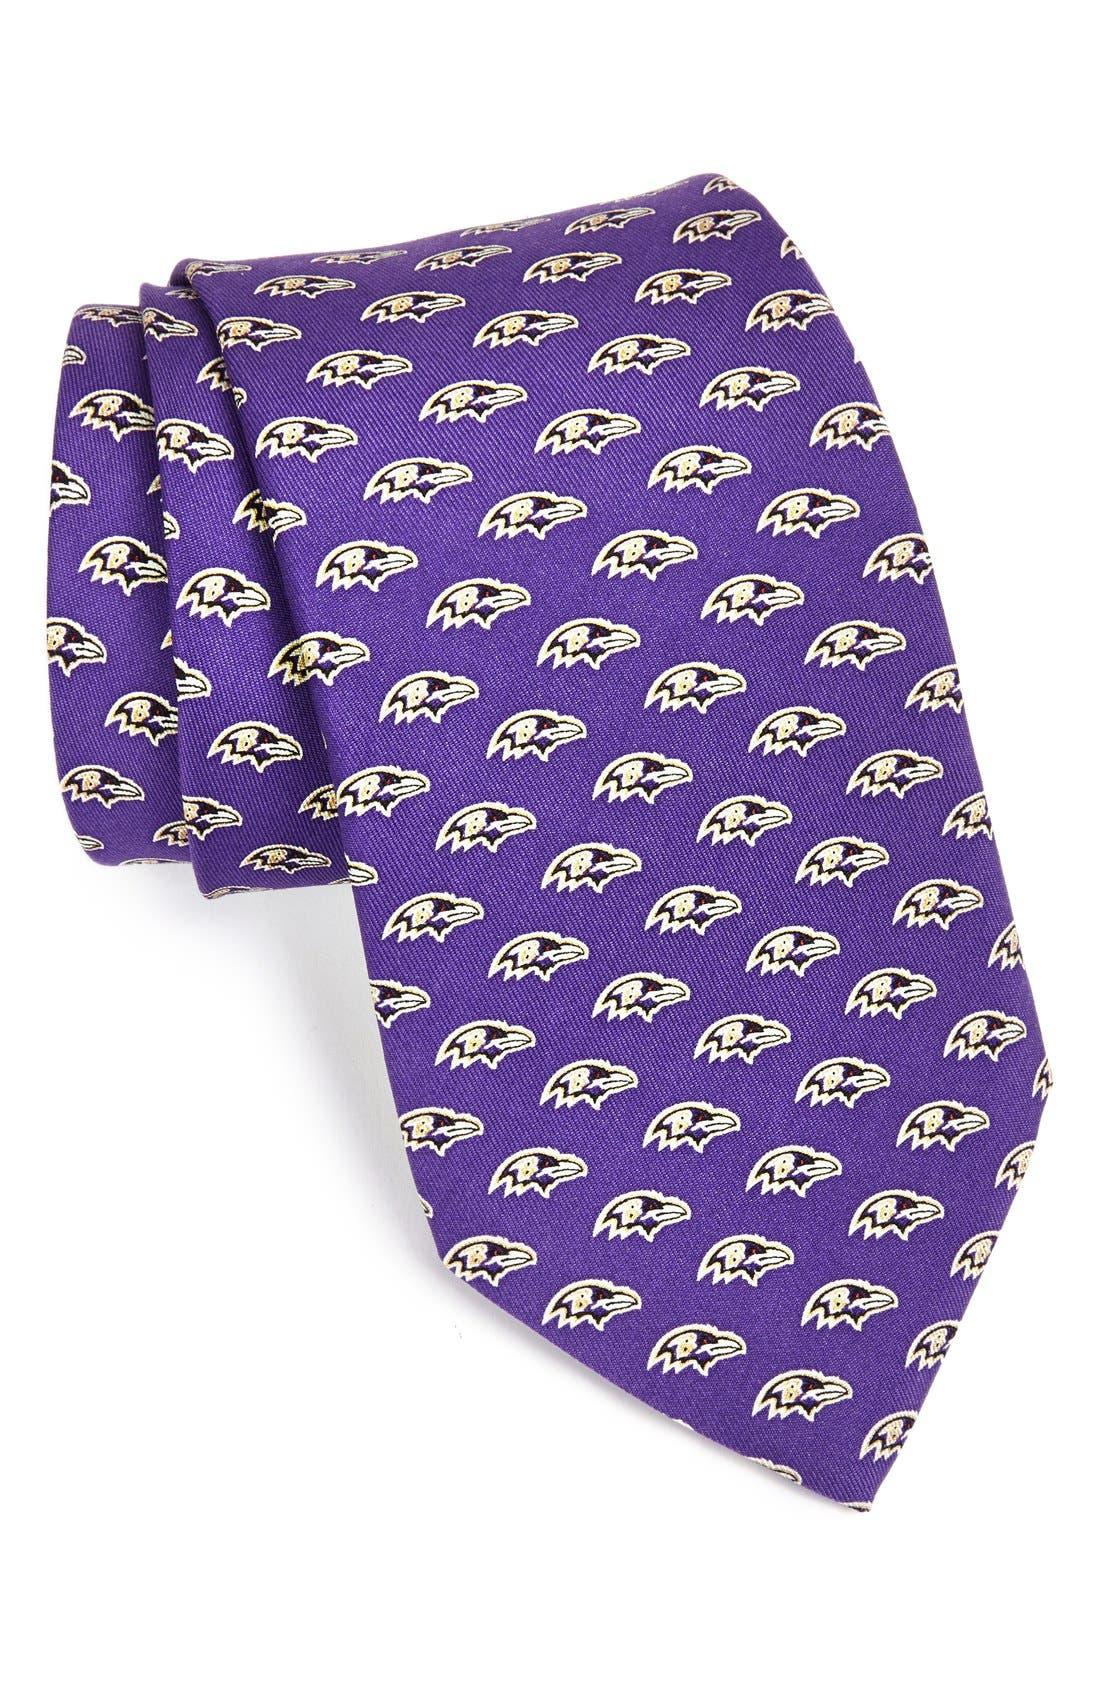 Baltimore Ravens - NFL Woven Silk Tie,                         Main,                         color, 525